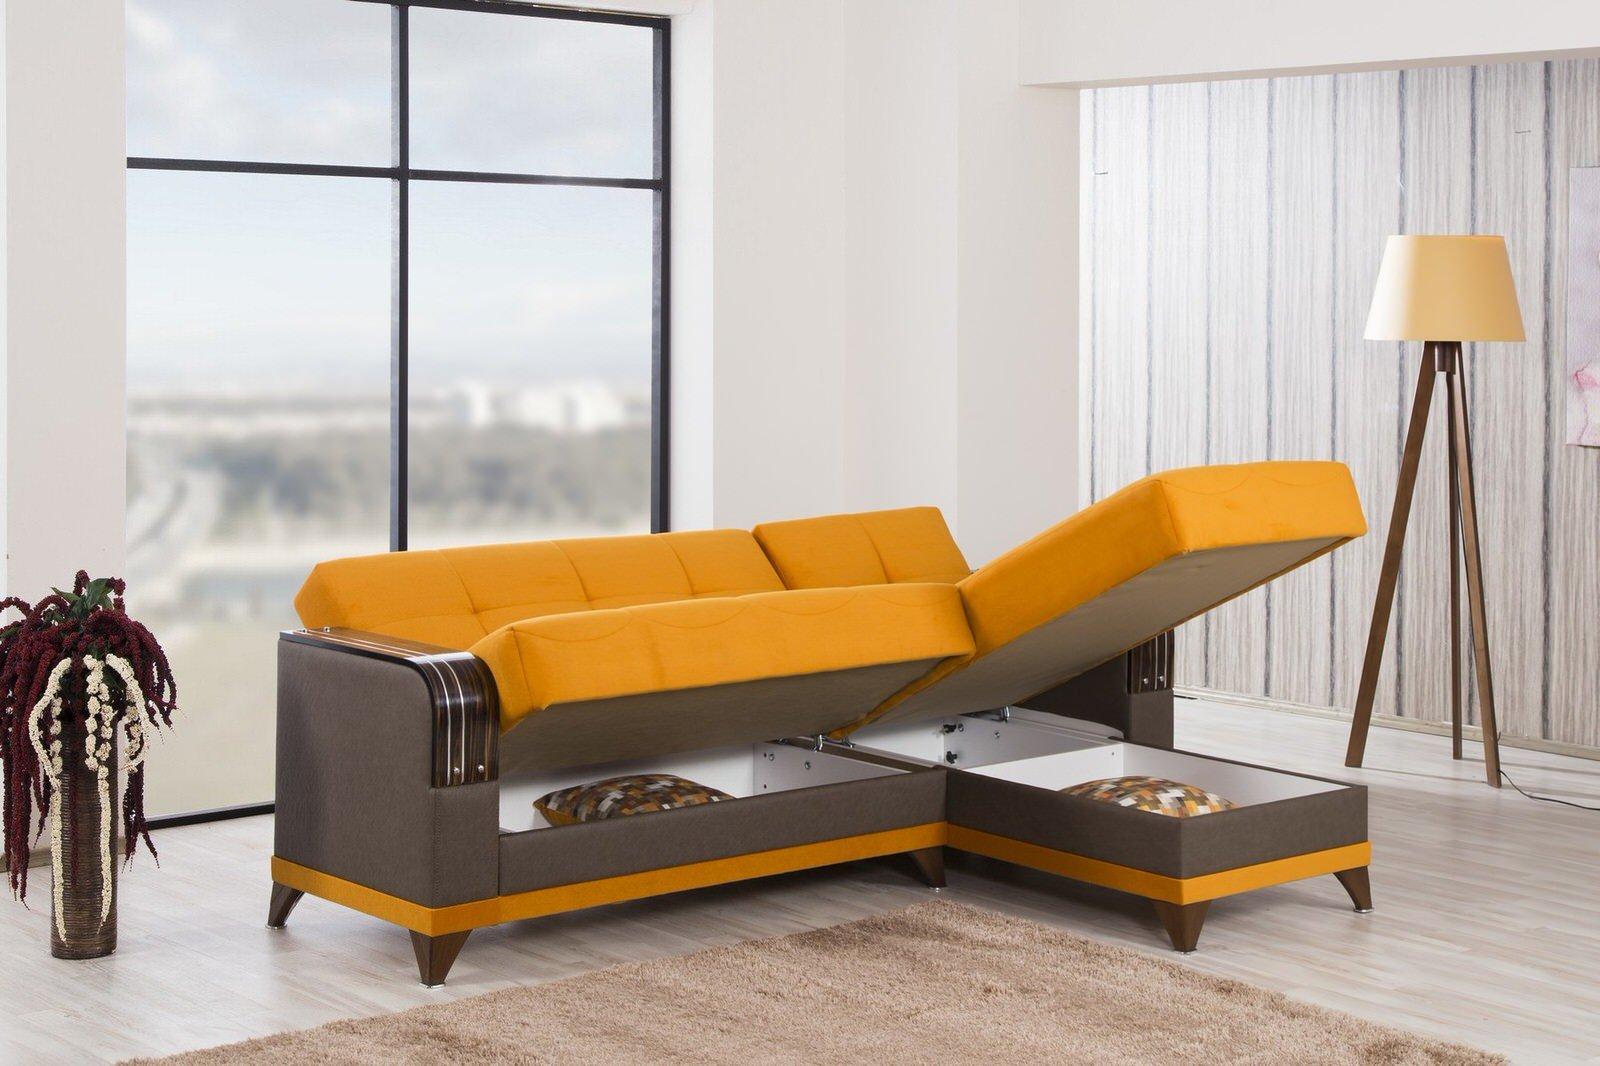 Almira Riva Orange Sectional Sofa by Casamode